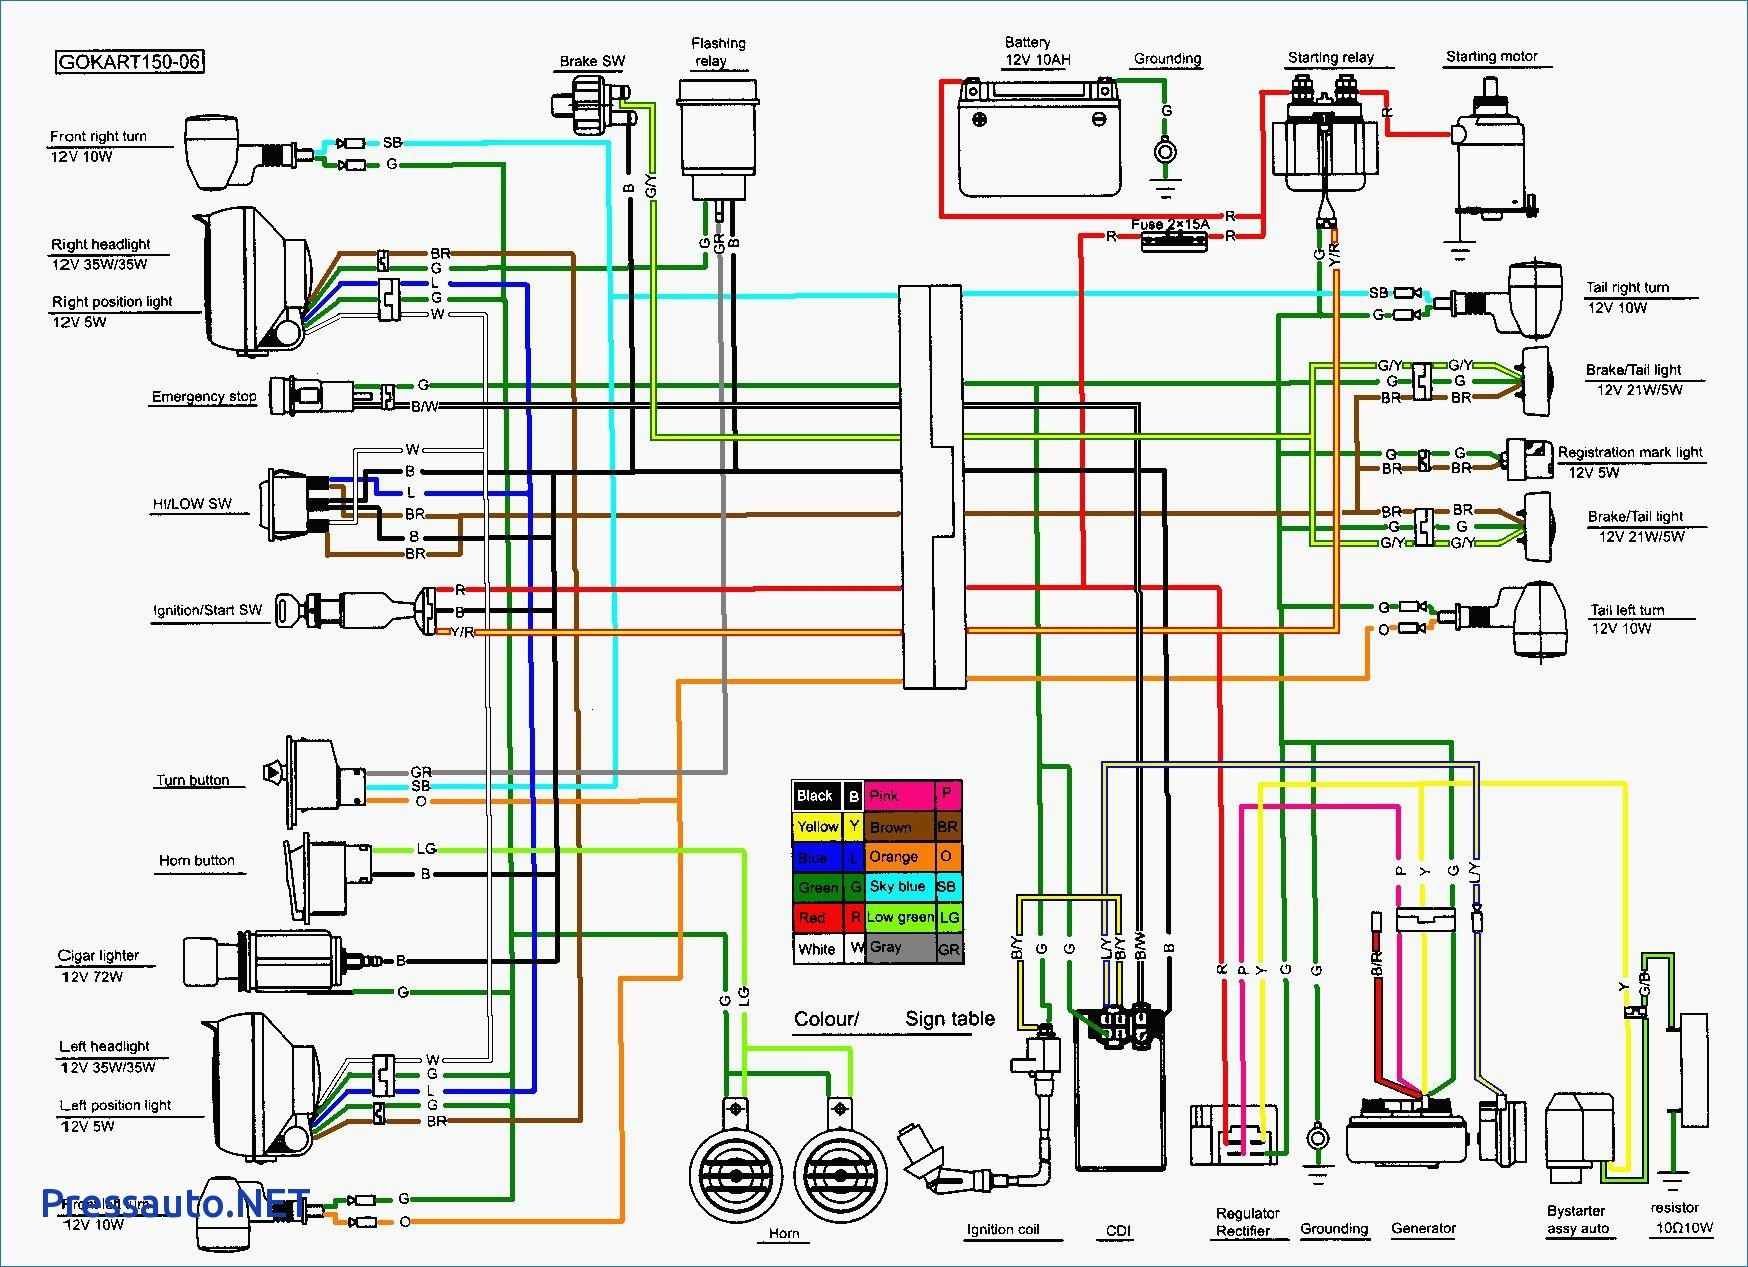 125Cc Atv Wiring - Wiring Diagram Data - Chinese Atv Wiring Diagram 50Cc